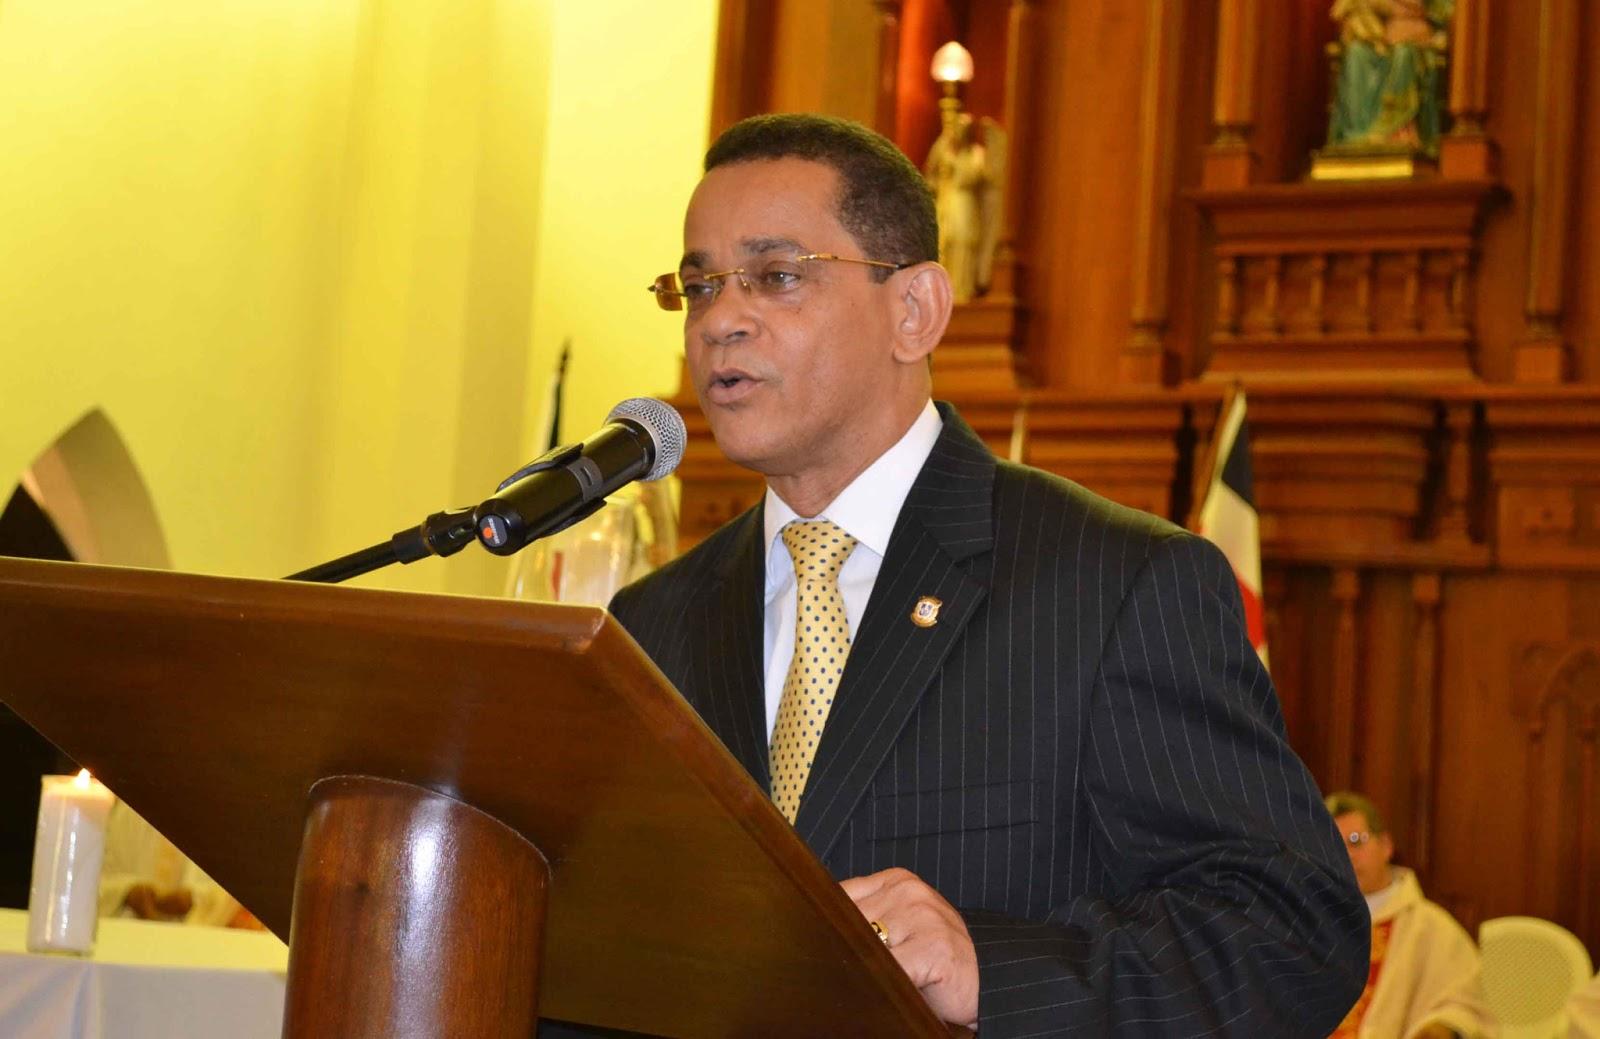 José Rafael Vargas afirma discurso LF presentó alternativas para superar impasse